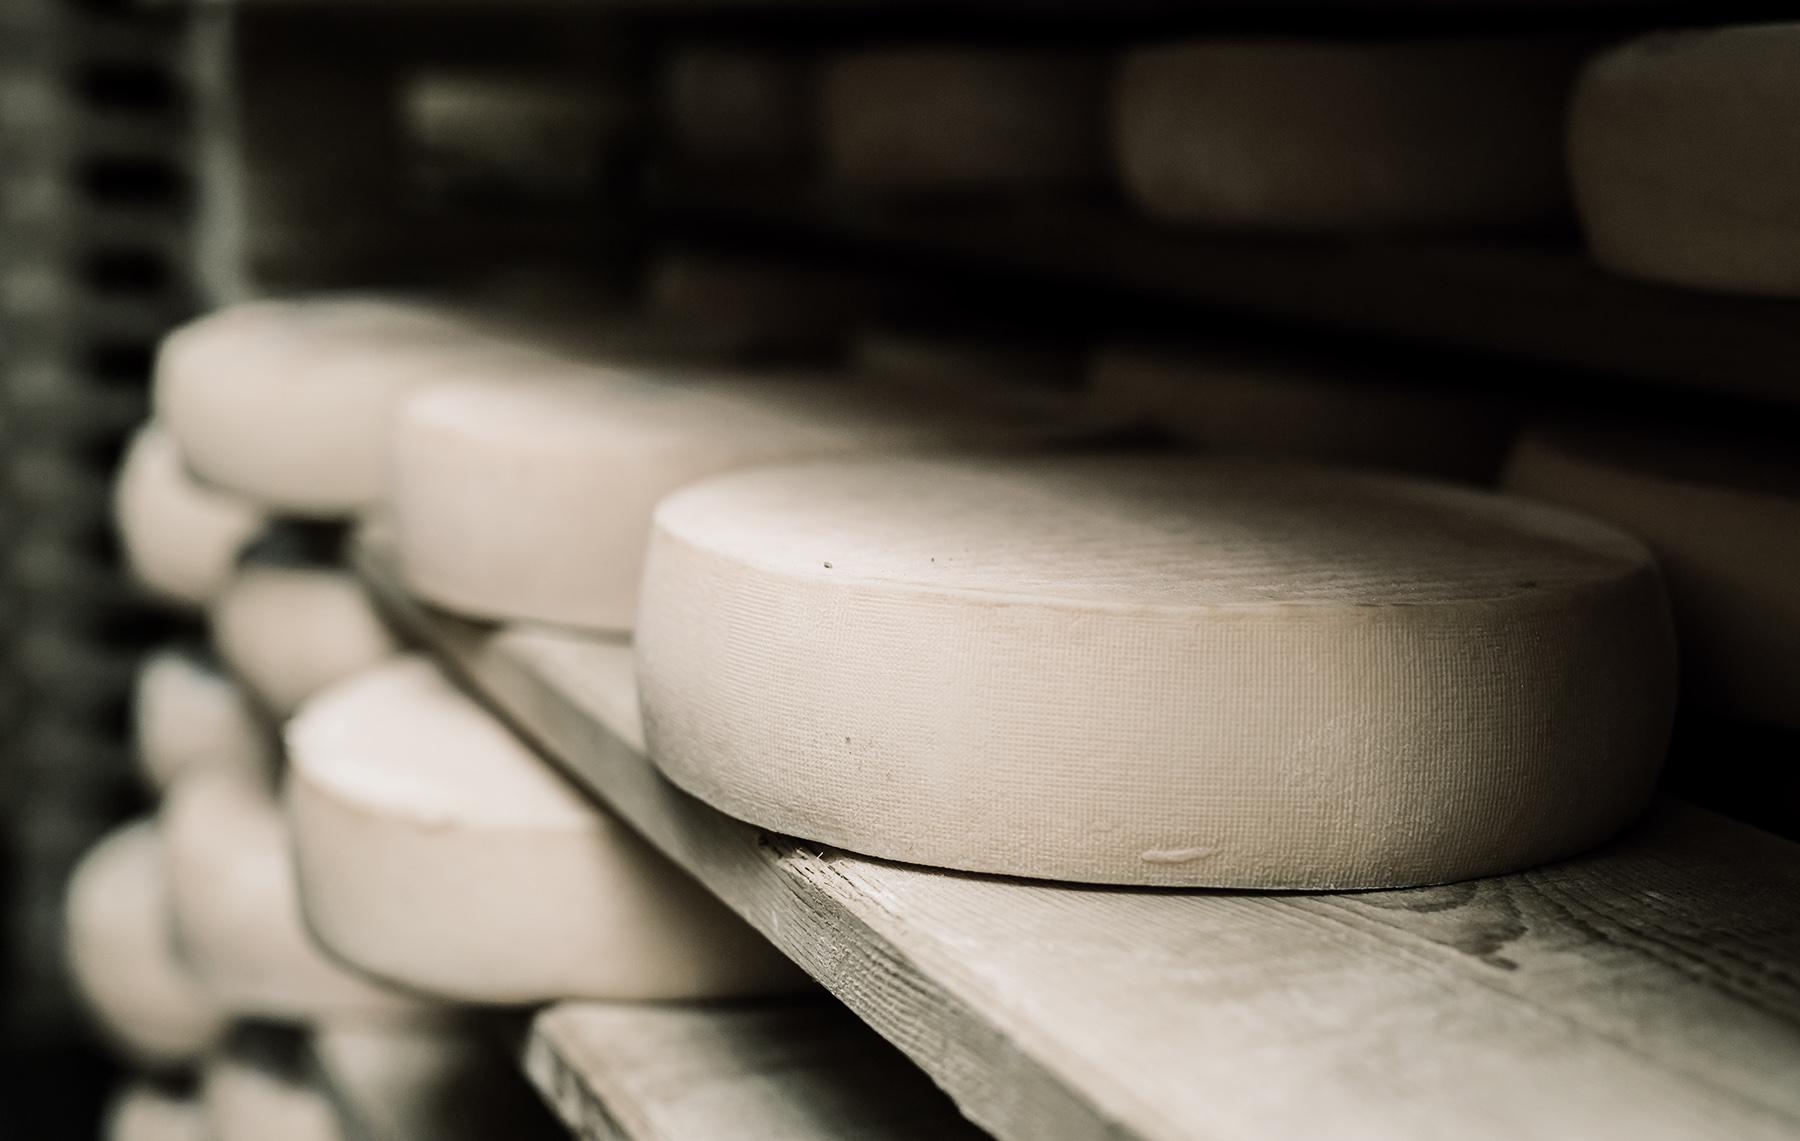 Cheese reel